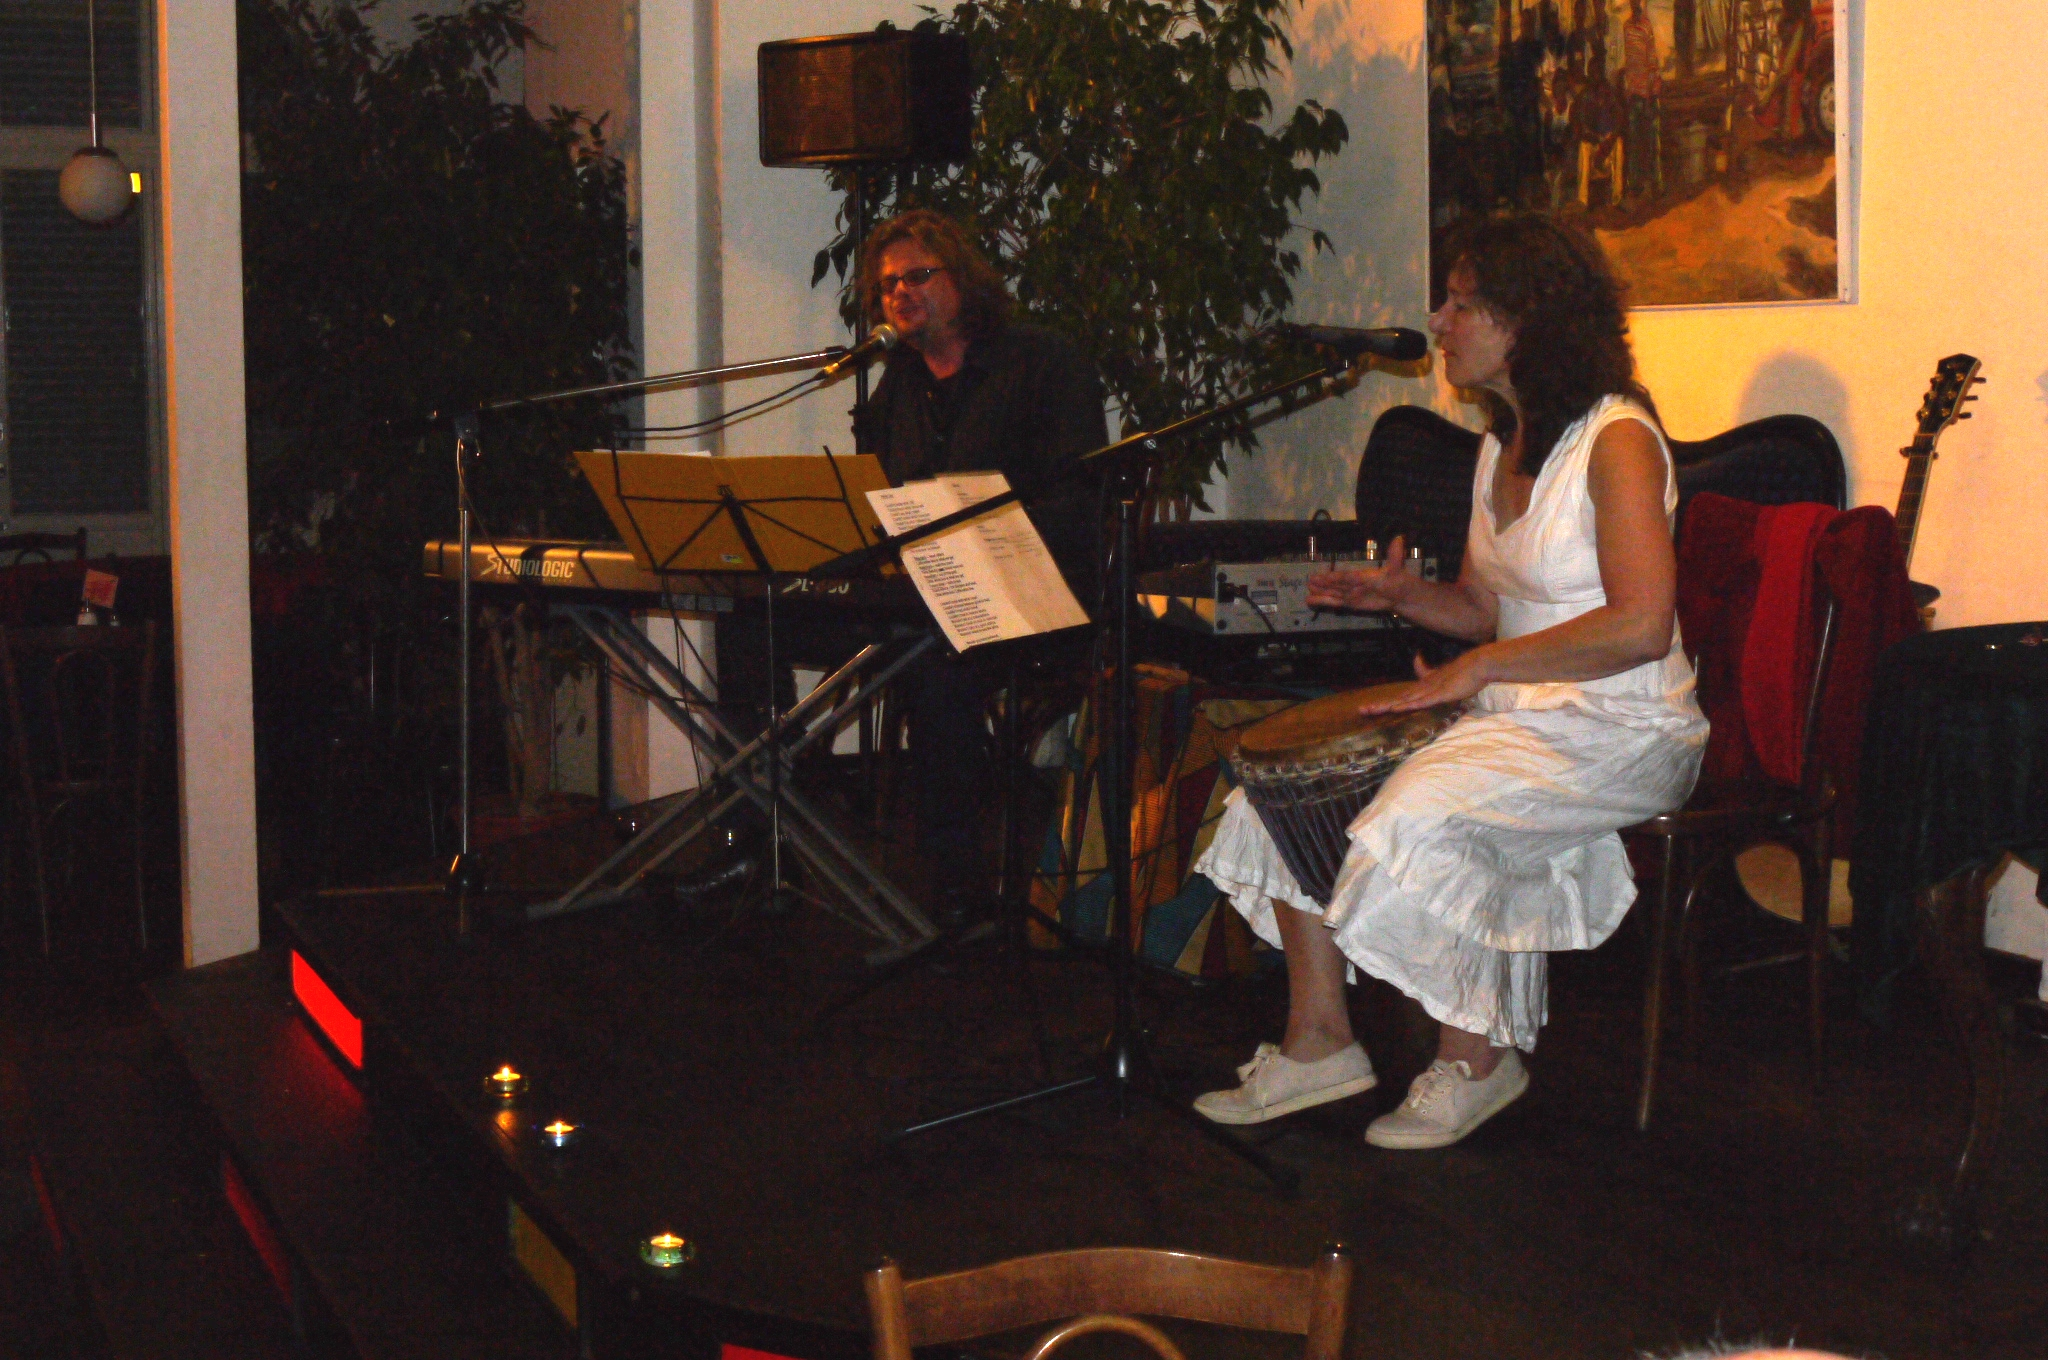 Nov. 2011 Duo Herzton (mit Karel Kaiser) im Balazzo Brozzi, Nürnberg